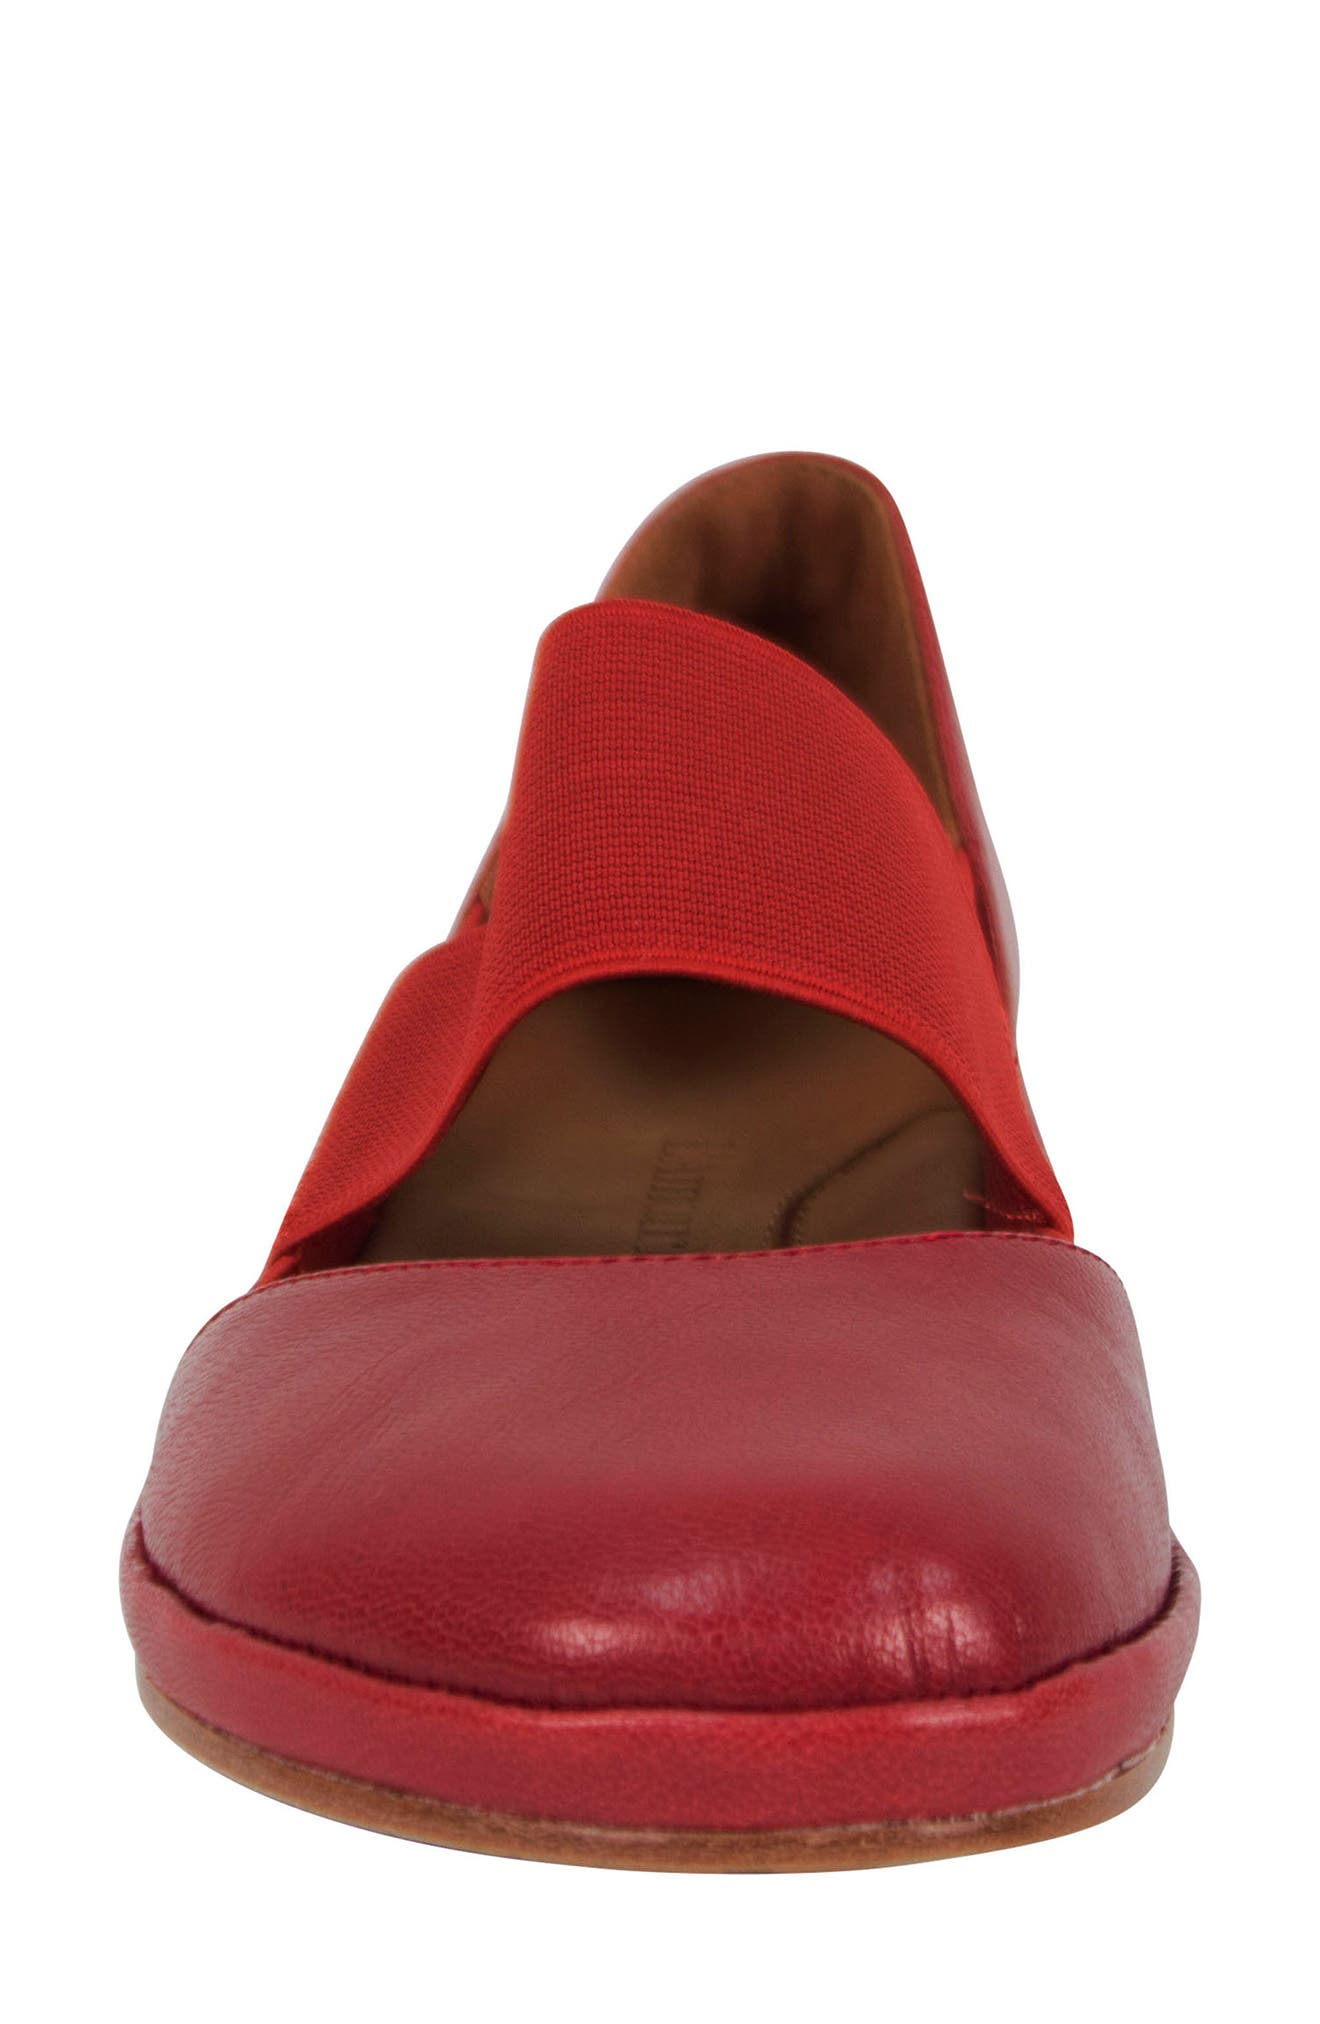 Camile Wedge Pump,                             Alternate thumbnail 5, color,                             Claret Leather